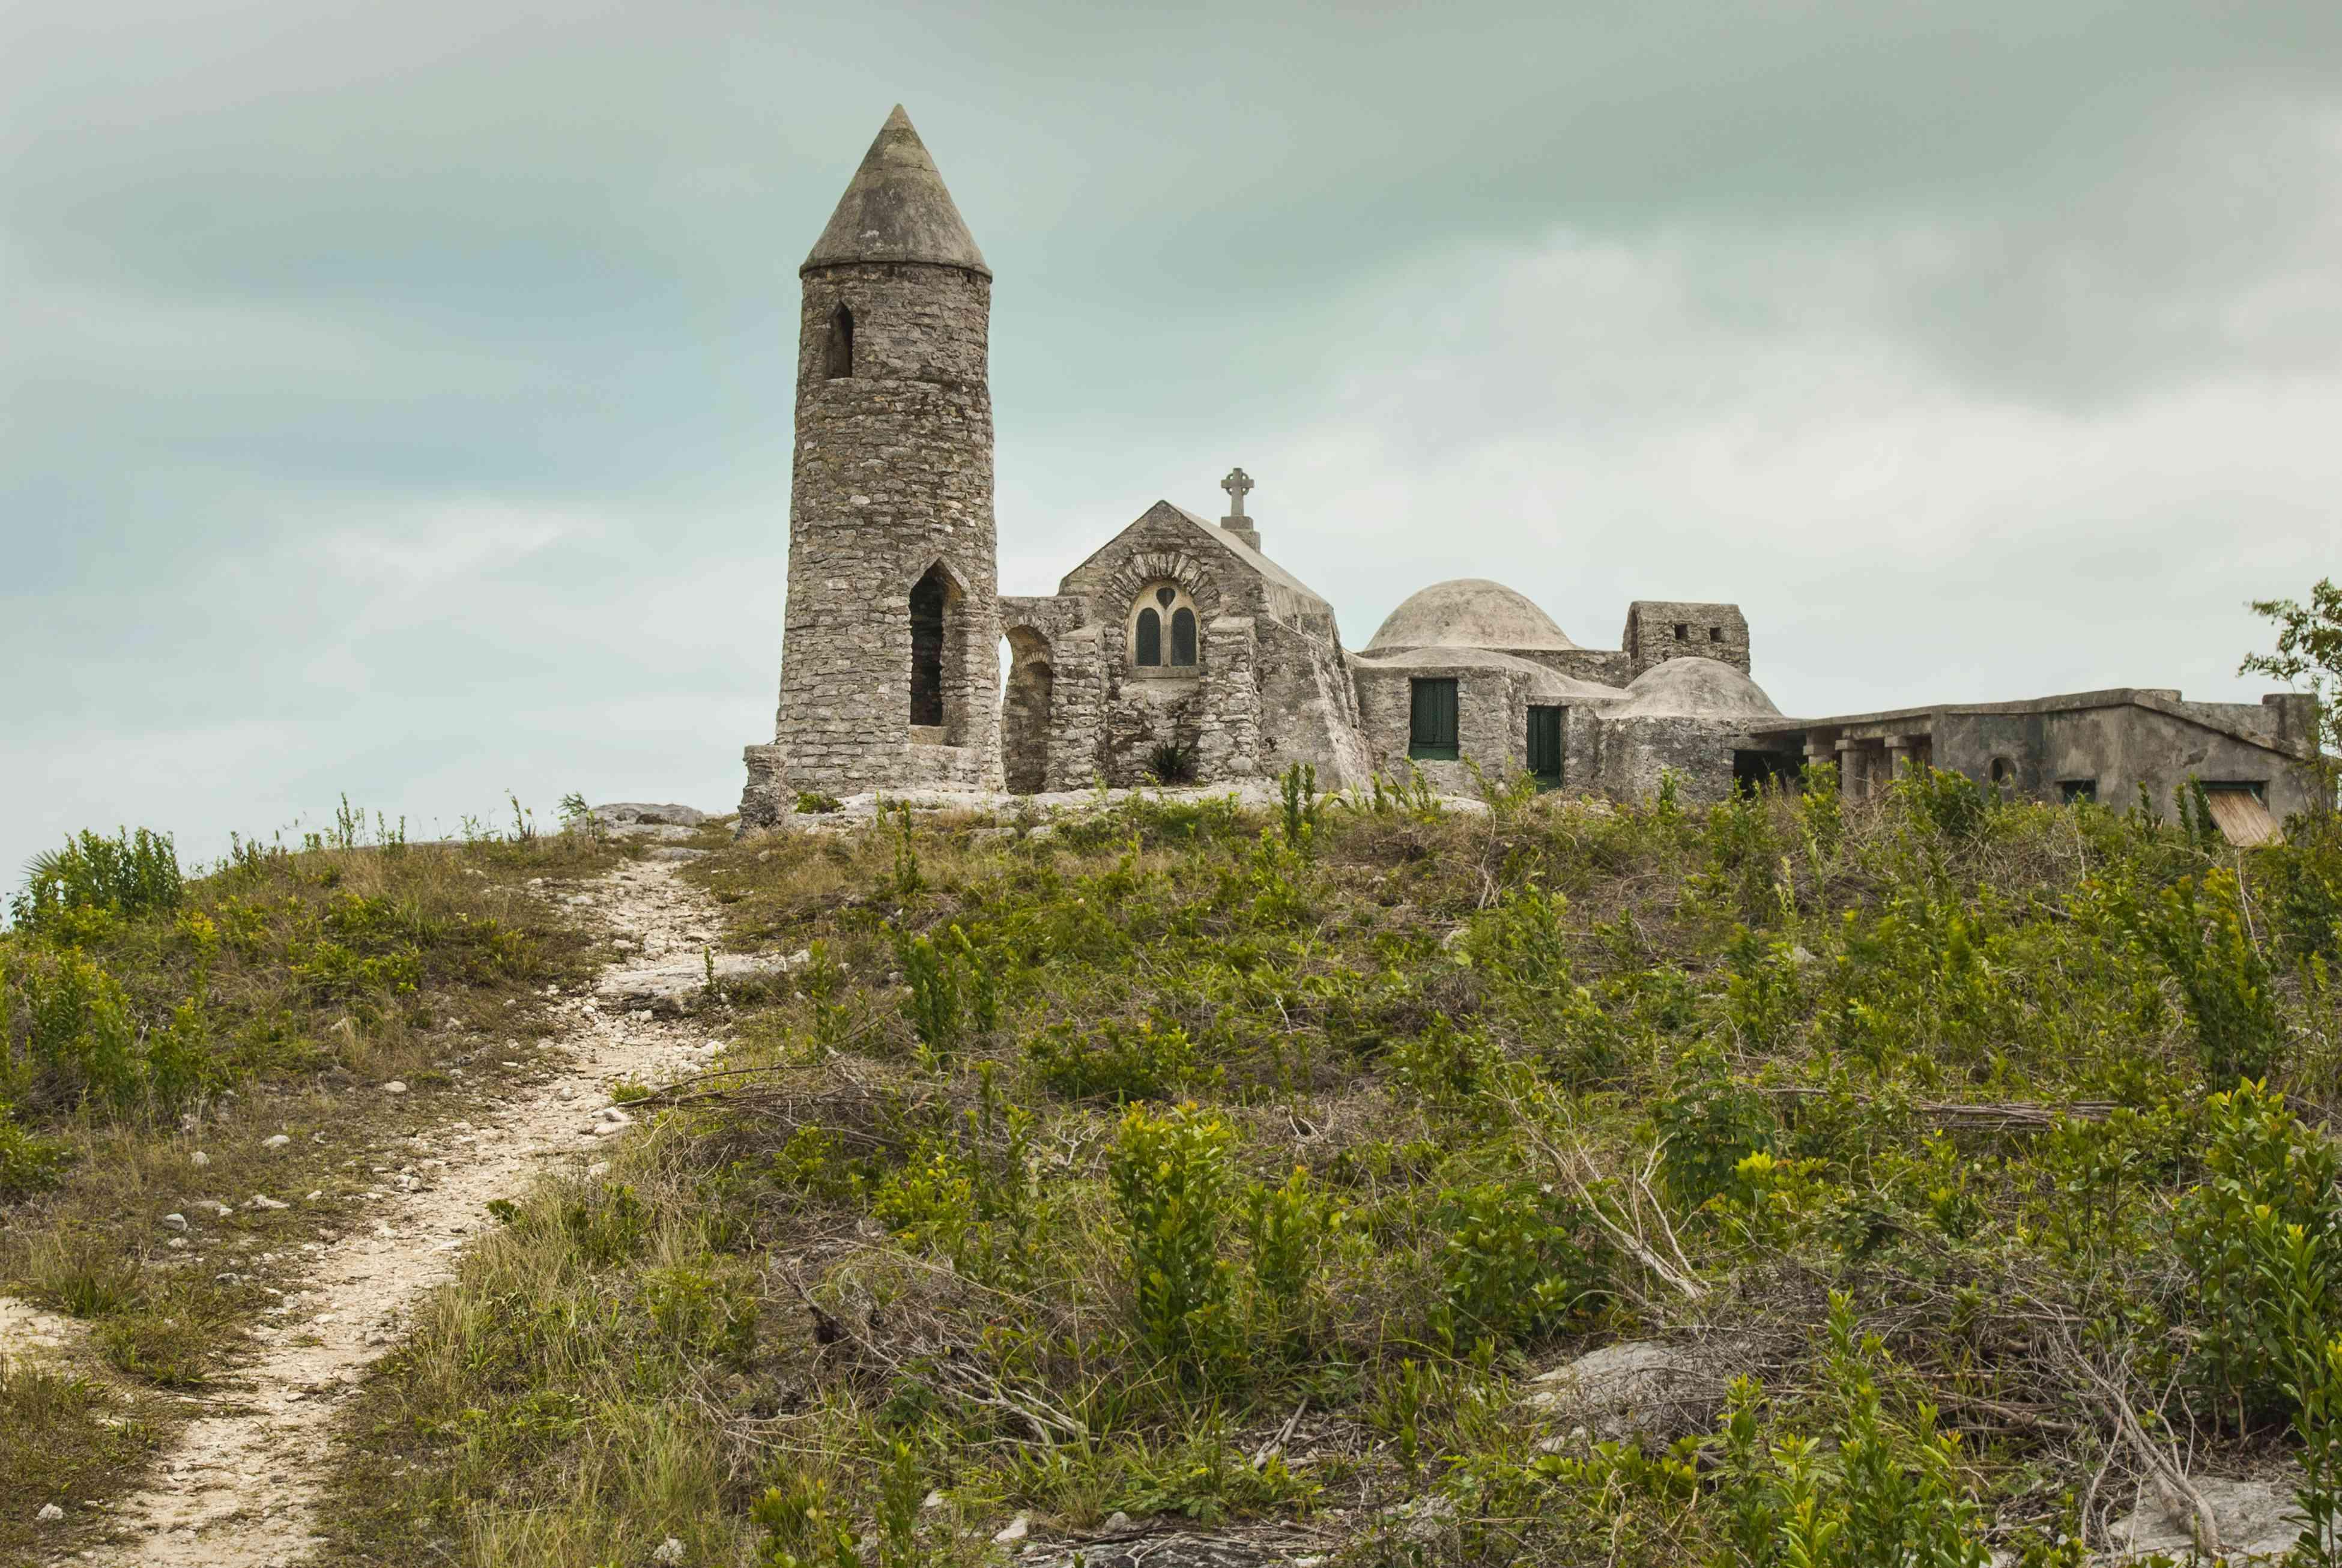 The Hermitage at Mount Alvernia on Cat Island, Bahamas